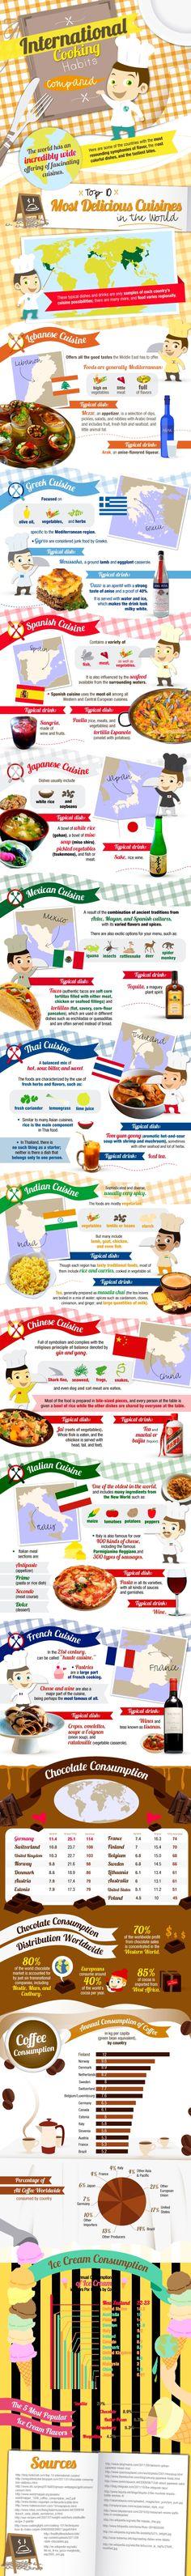 International Cooking Habits